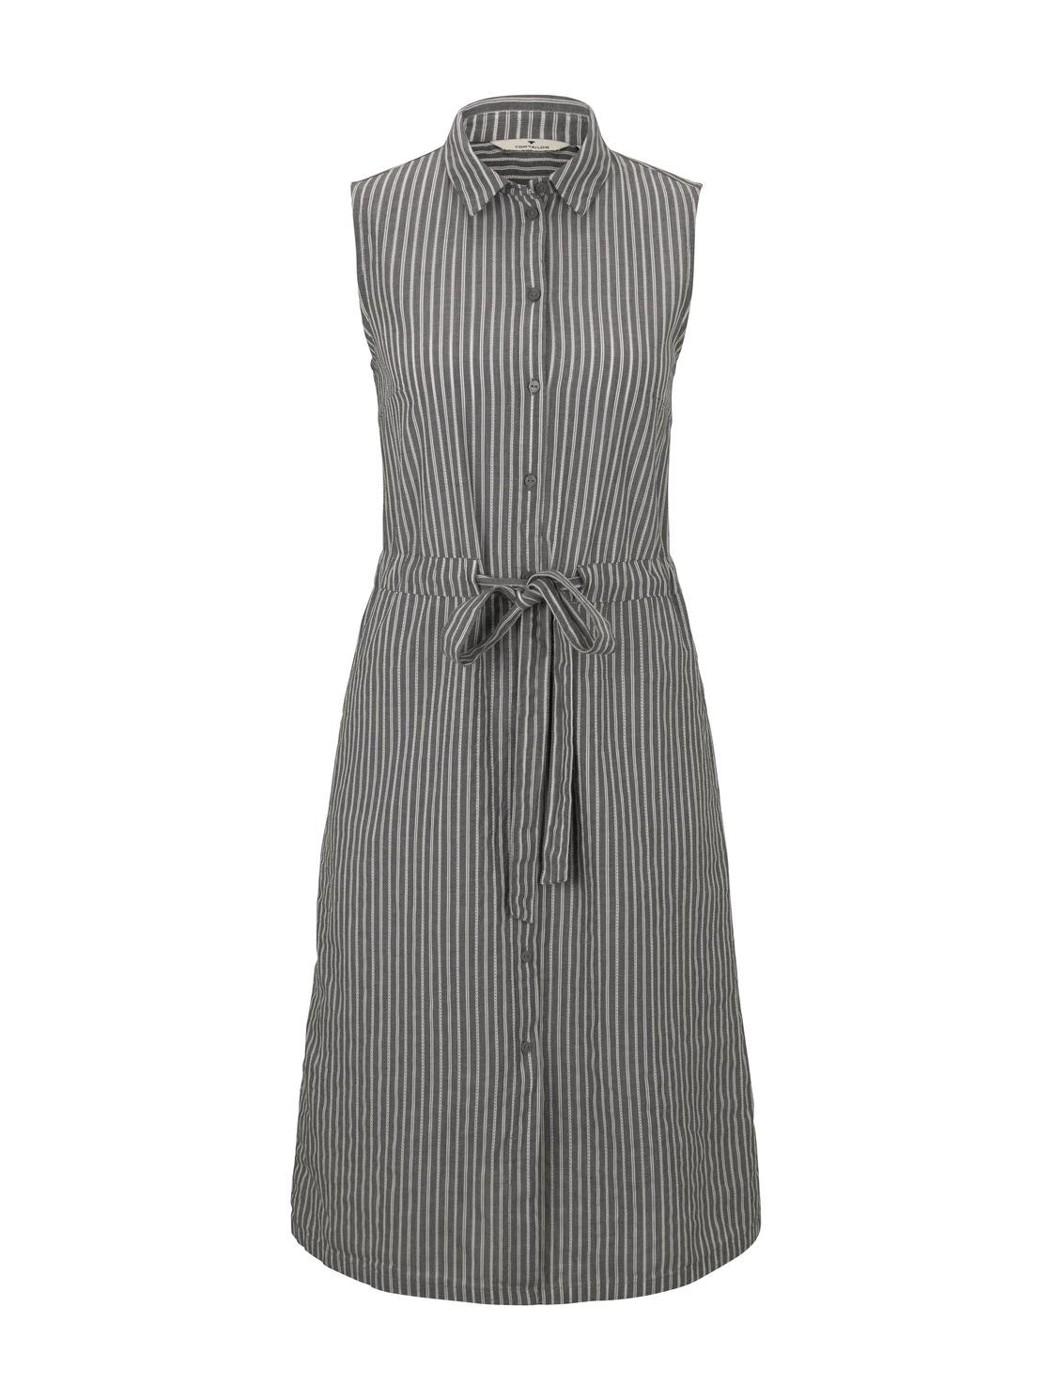 dress shirt style with stripes - Damen